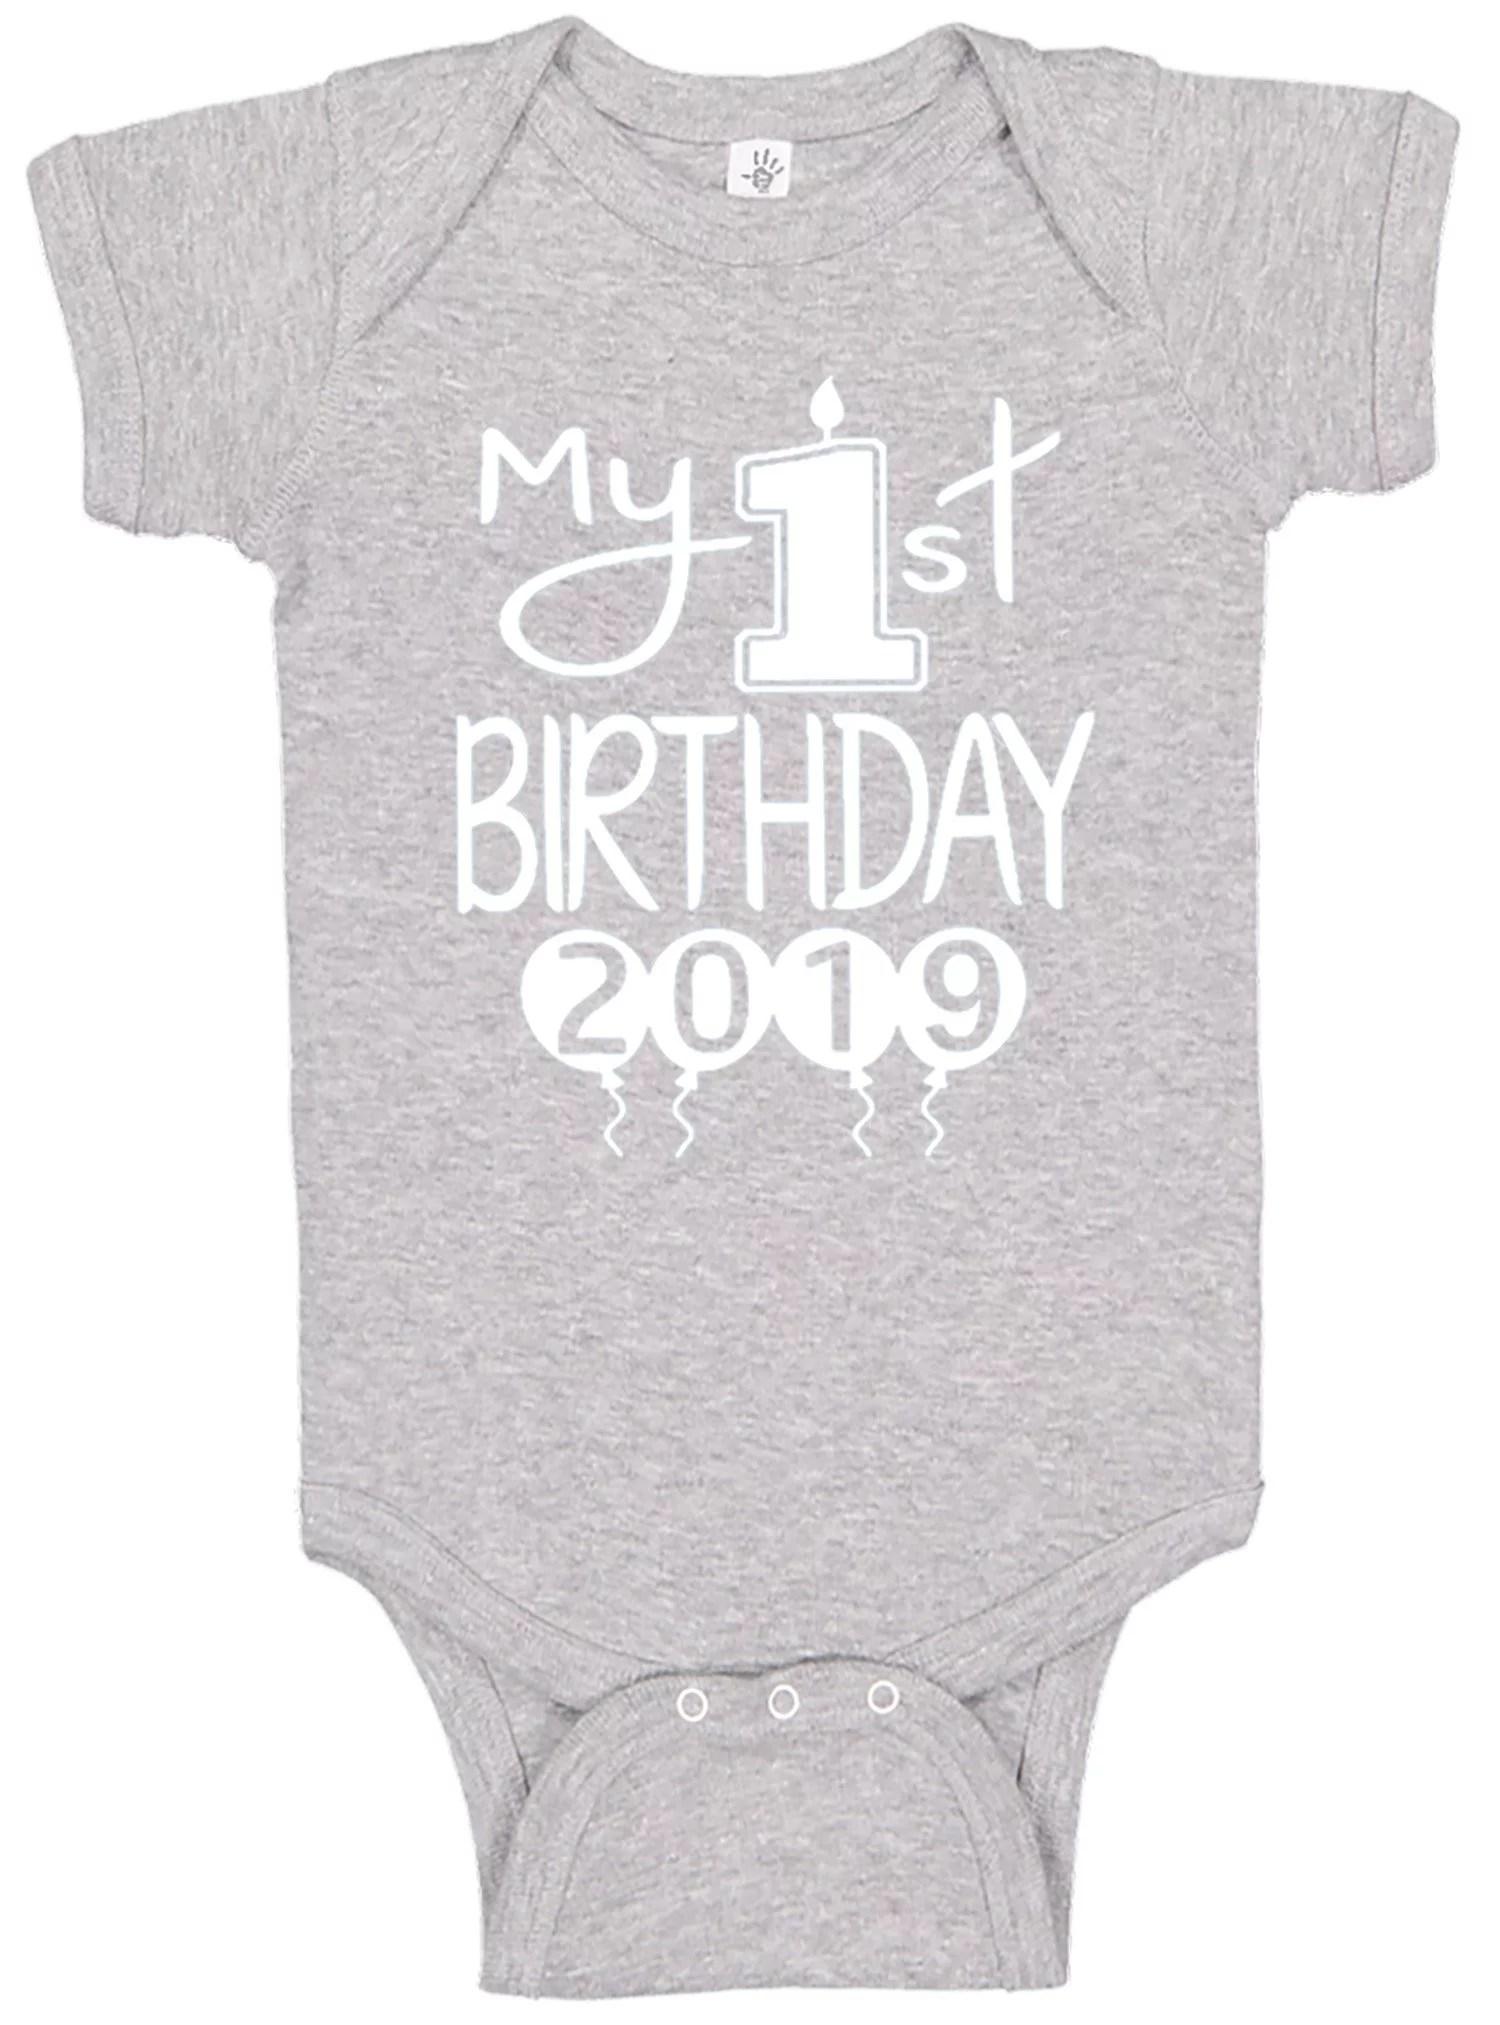 Aiden S Corner Handmade Screen Pressed Baby First Birthday Bodysuits Boys My 1st Birthday Outfit Walmart Com Walmart Com